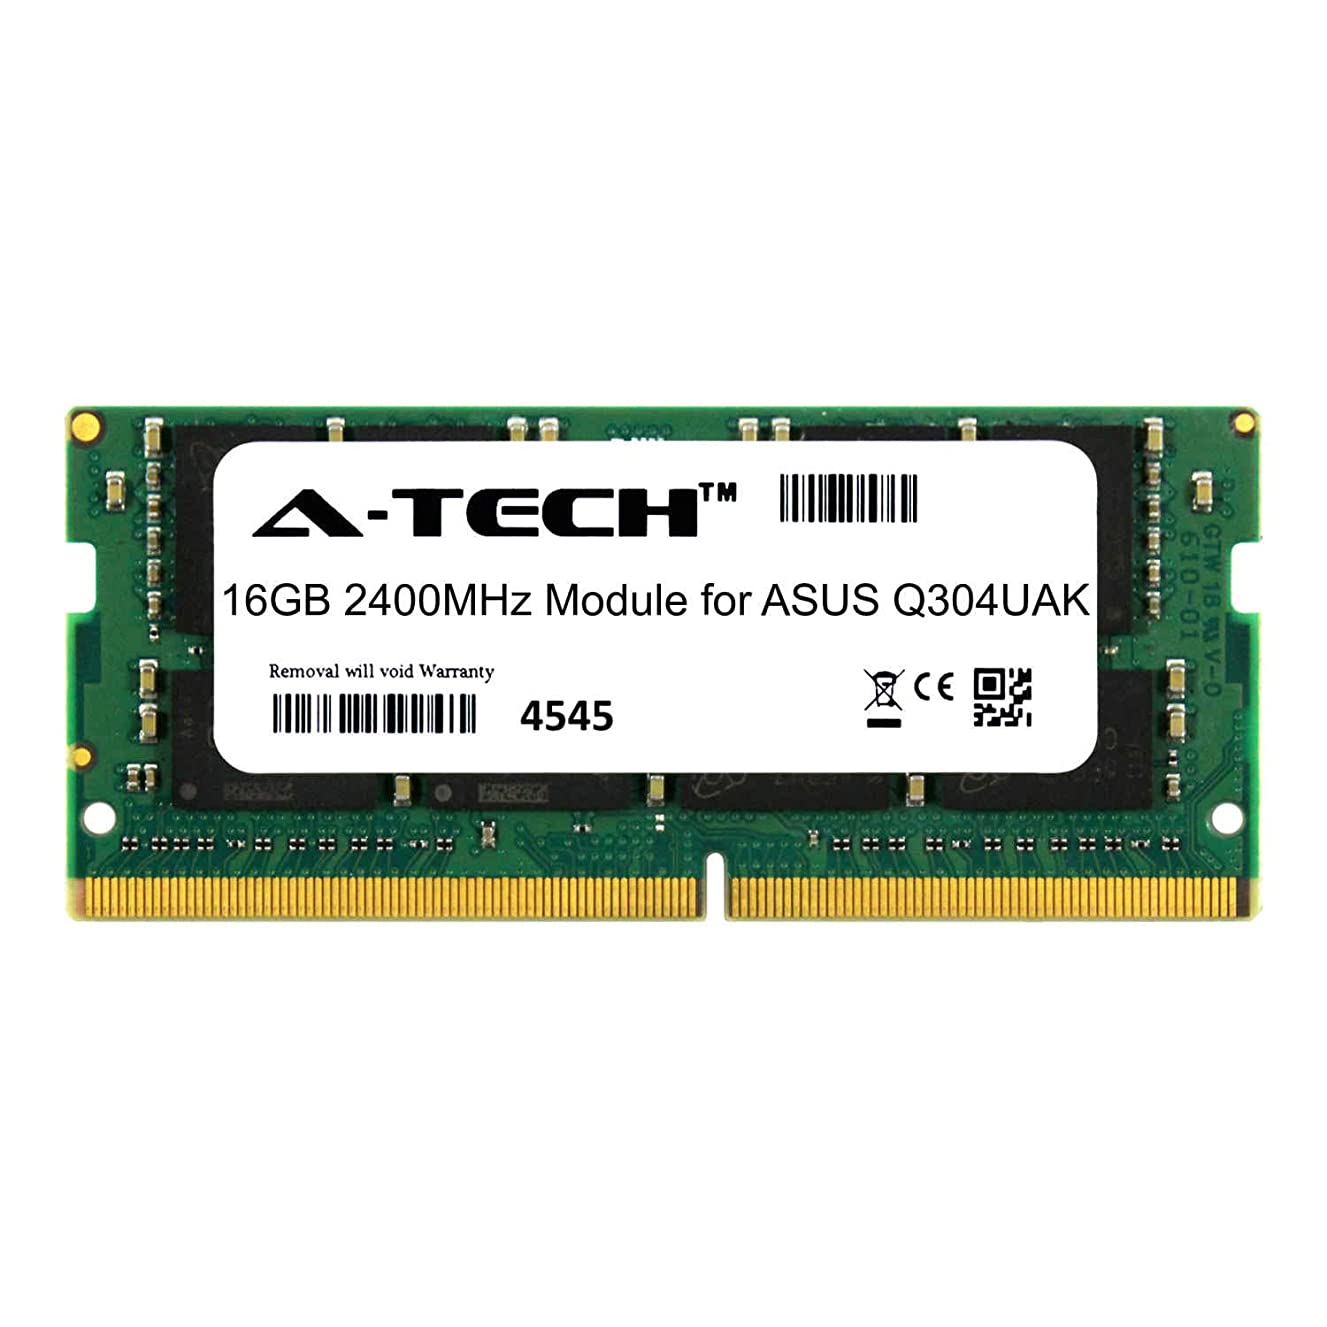 A-Tech 16GB Module for ASUS Q304UAK Laptop & Notebook Compatible DDR4 2400Mhz Memory Ram (ATMS394432A25831X1)